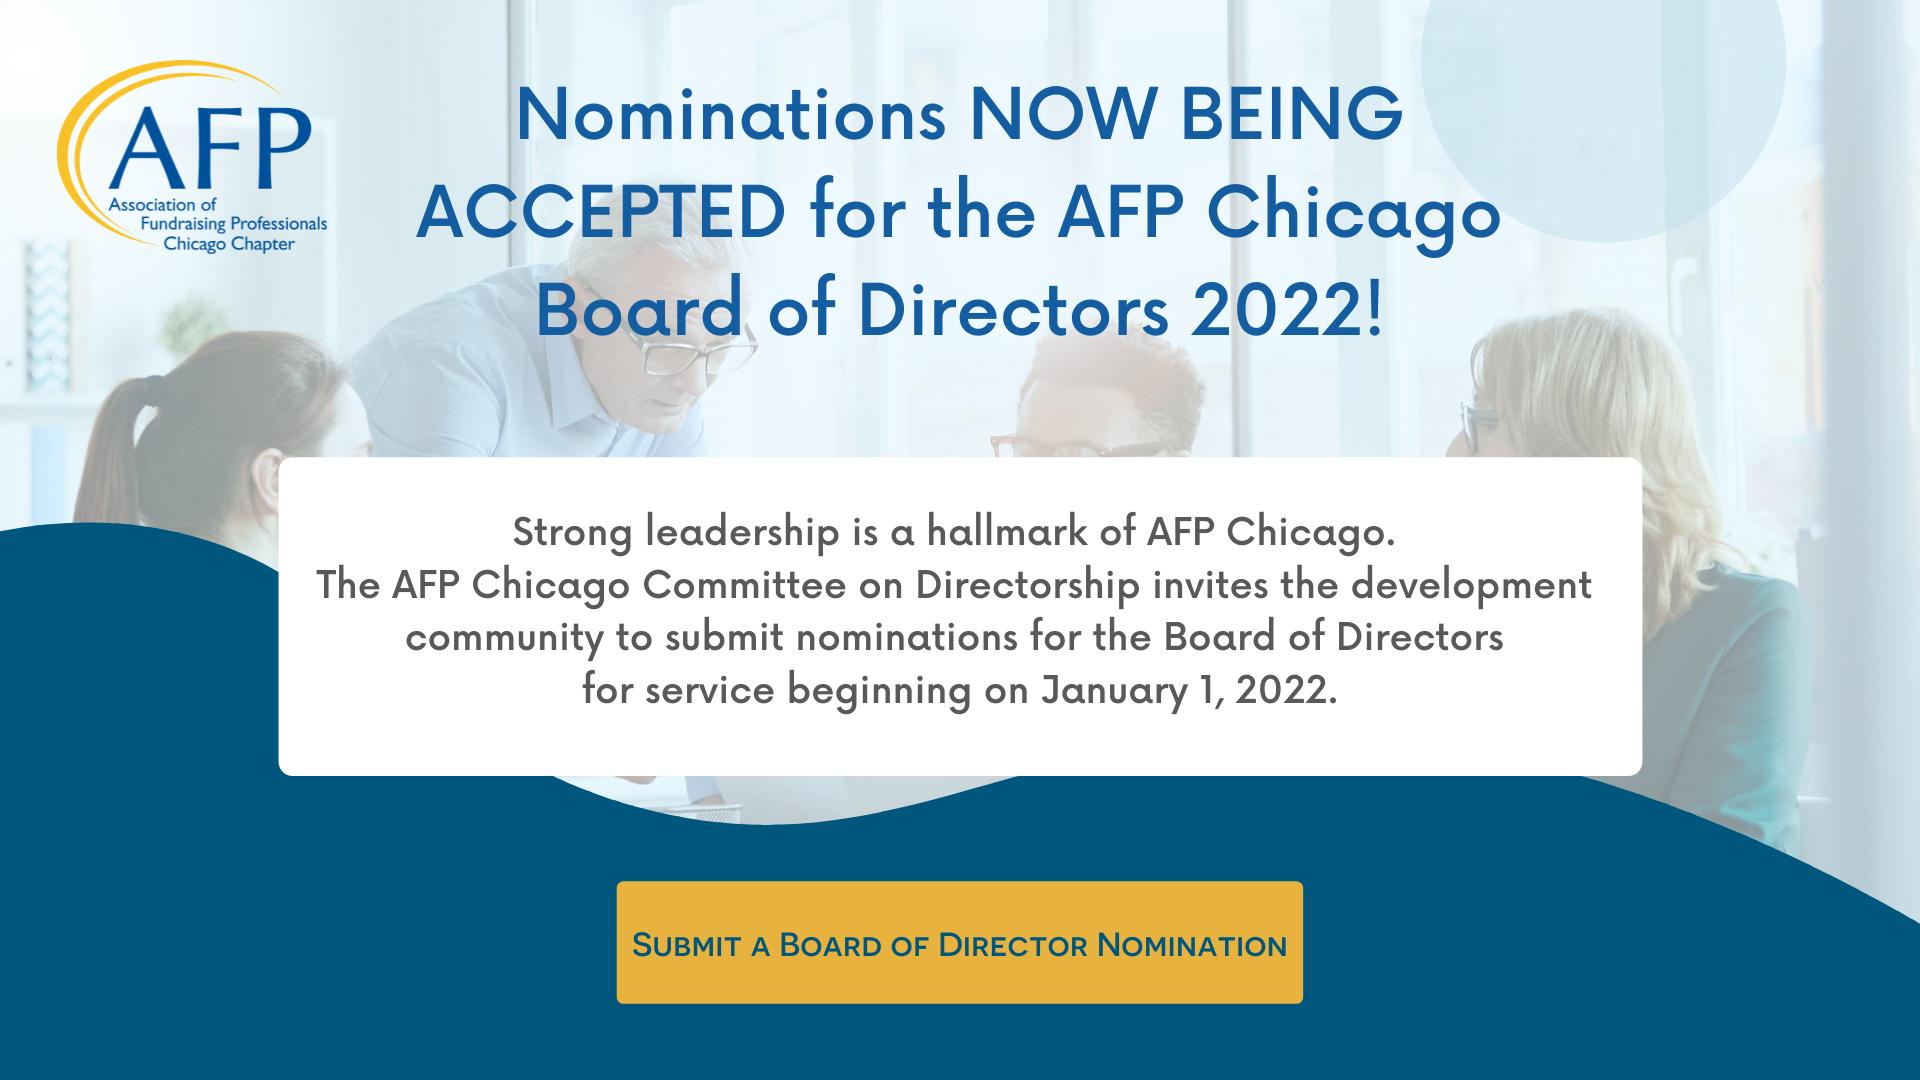 Board of Director Nominations